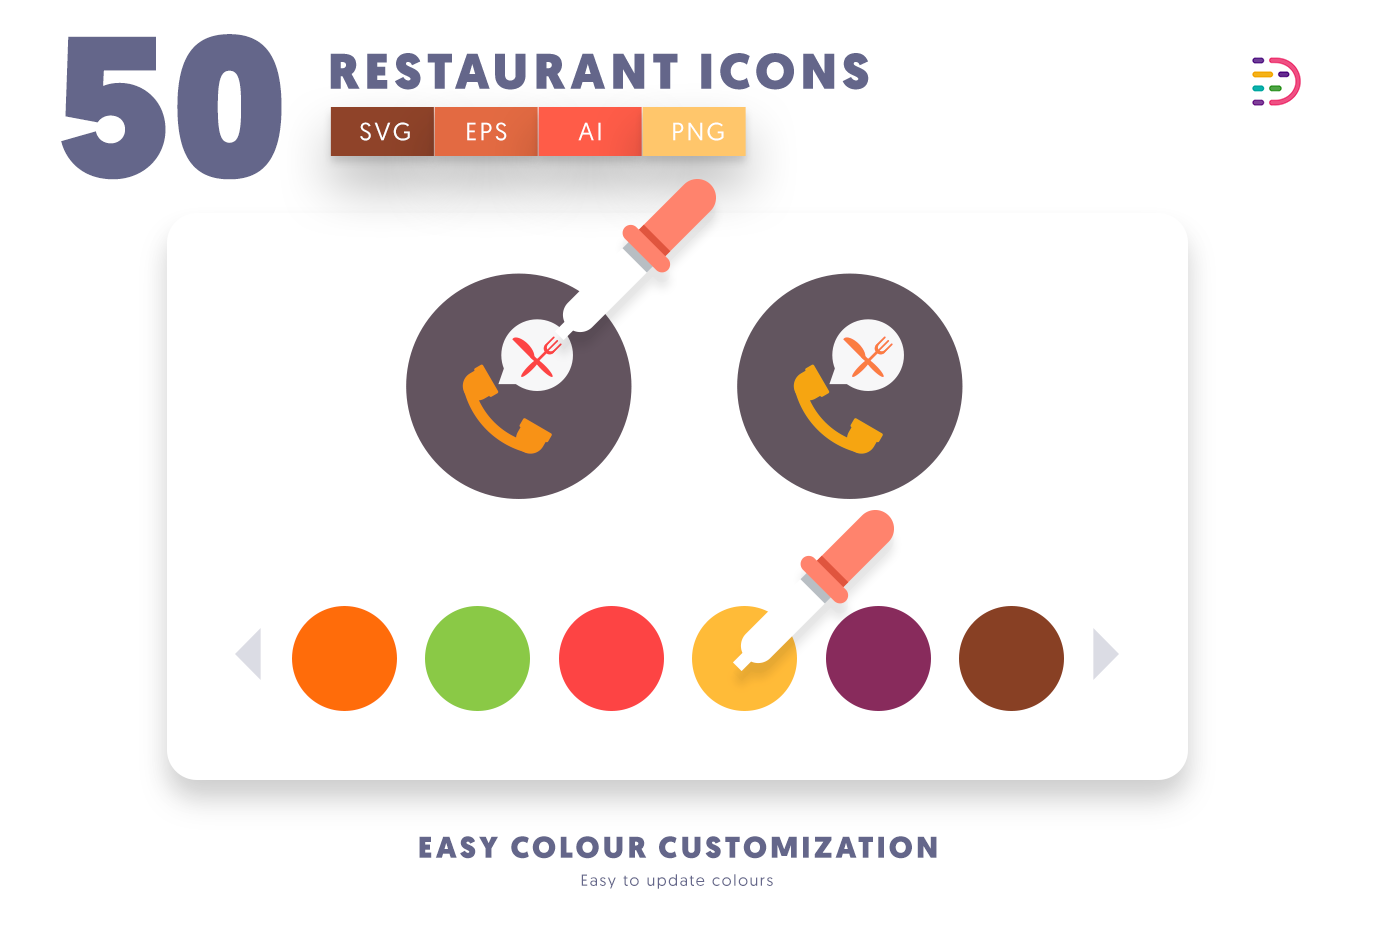 Design ready 50 Restaurant Icons